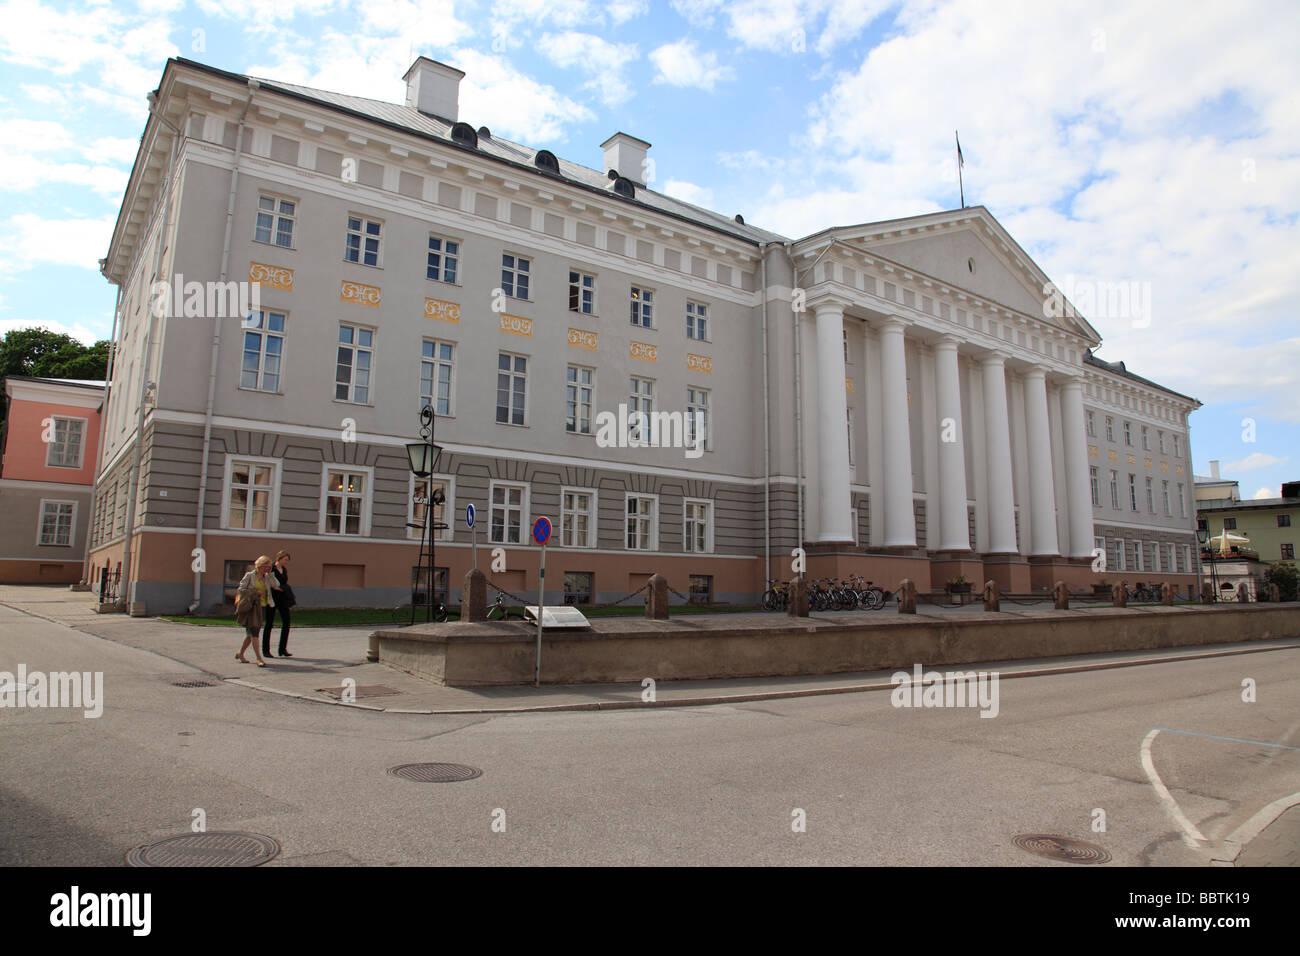 university of Tartu, Estonia, Baltic Nation, Eastern Europe. Photo by Willy Matheisl - Stock Image